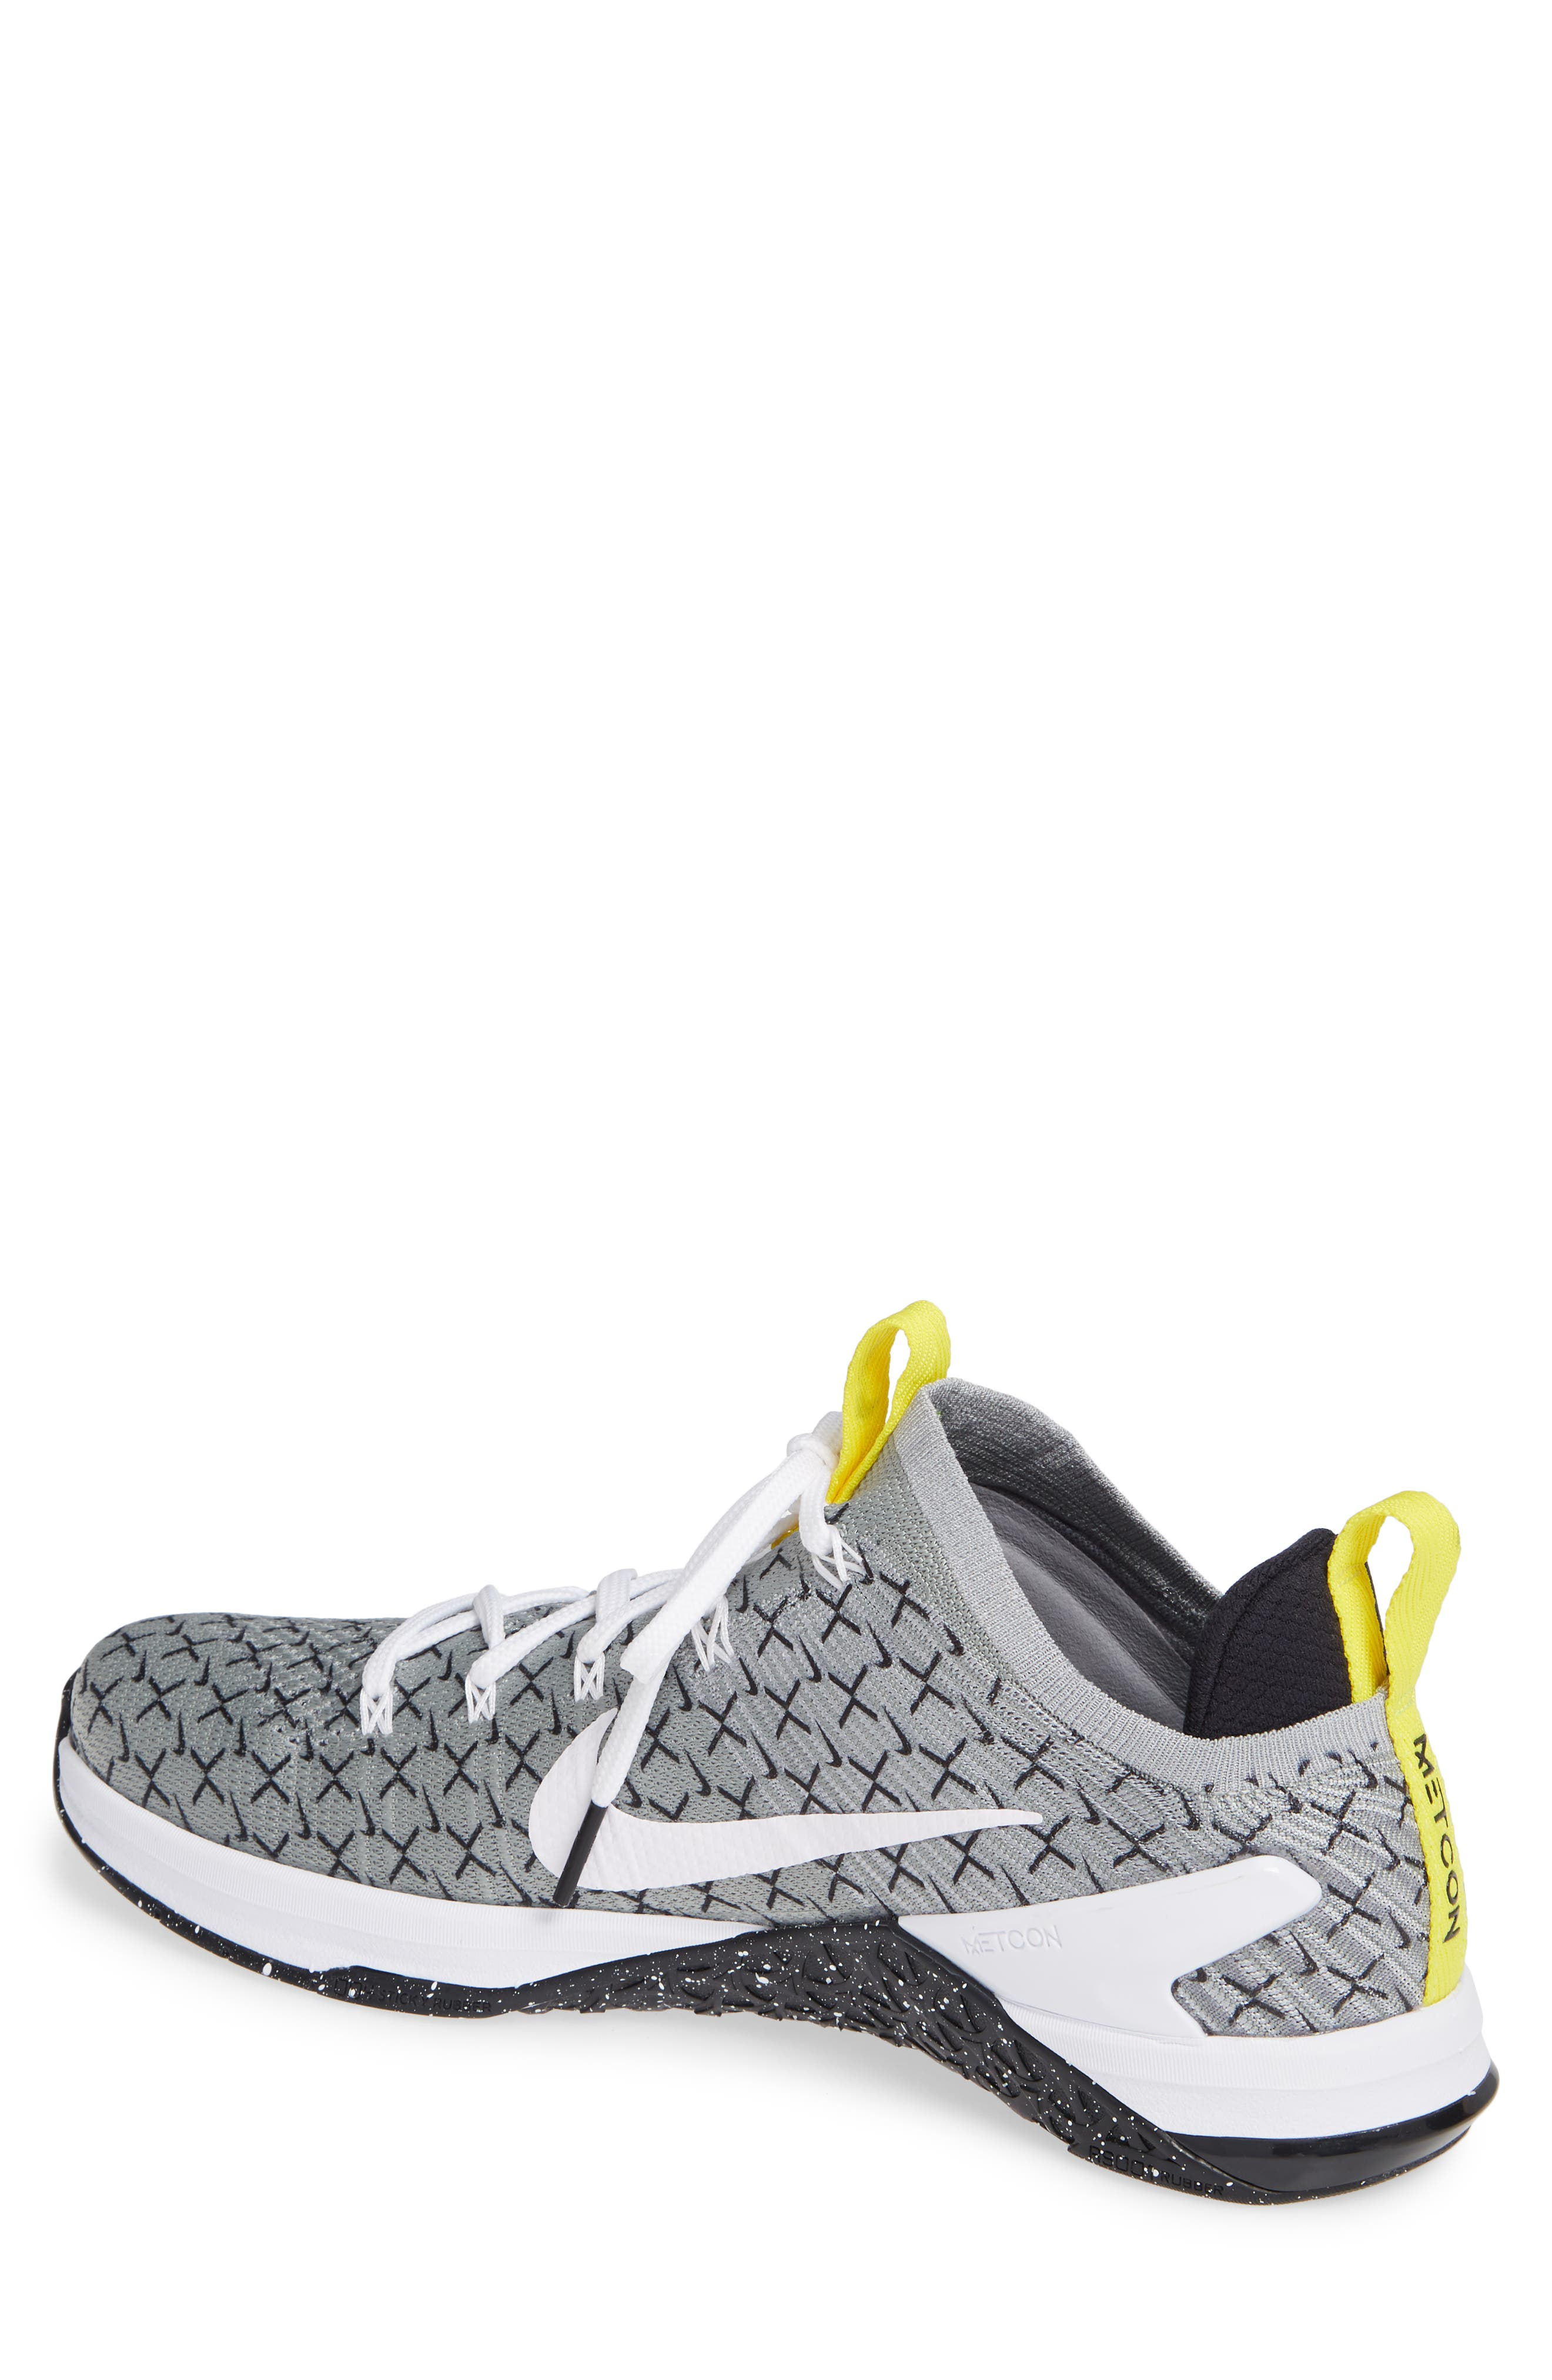 Metcon DSX Flyknit 2 Training Shoe,                             Alternate thumbnail 2, color,                             Black/ White/ Yellow